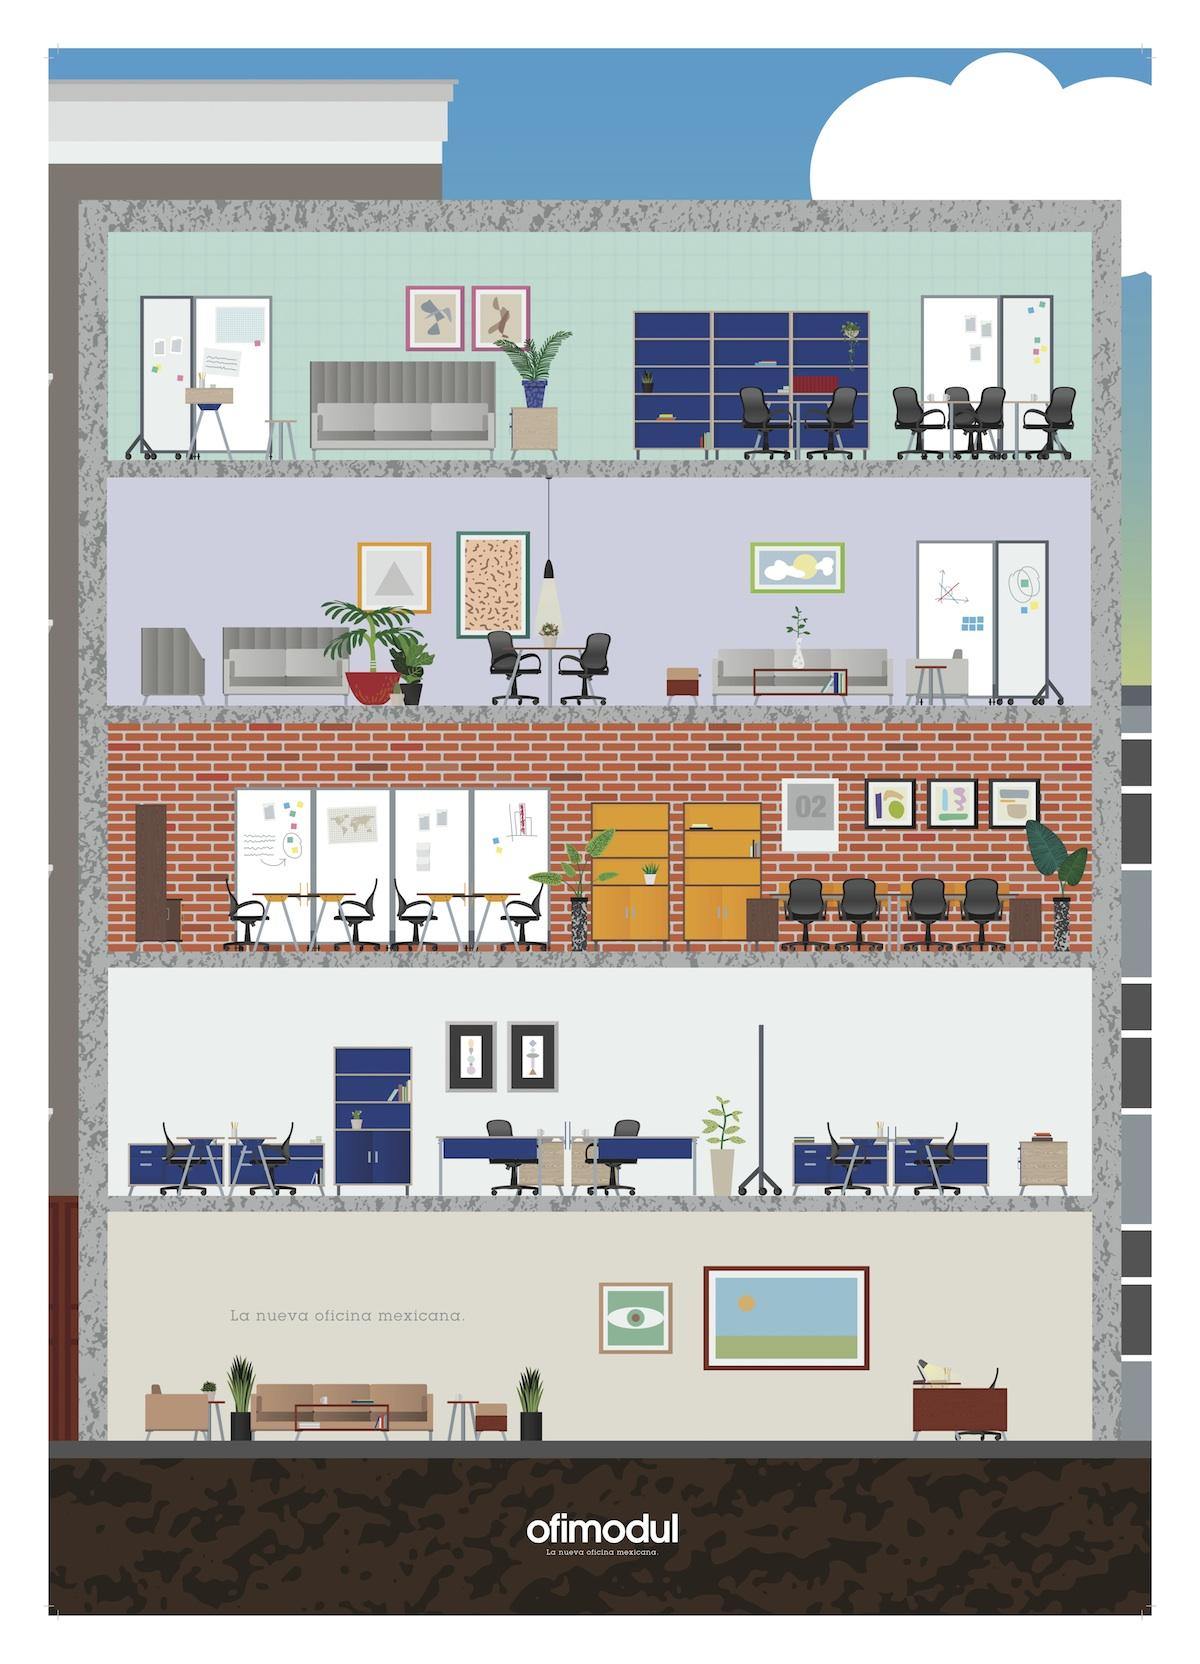 linea-02-poster.jpg